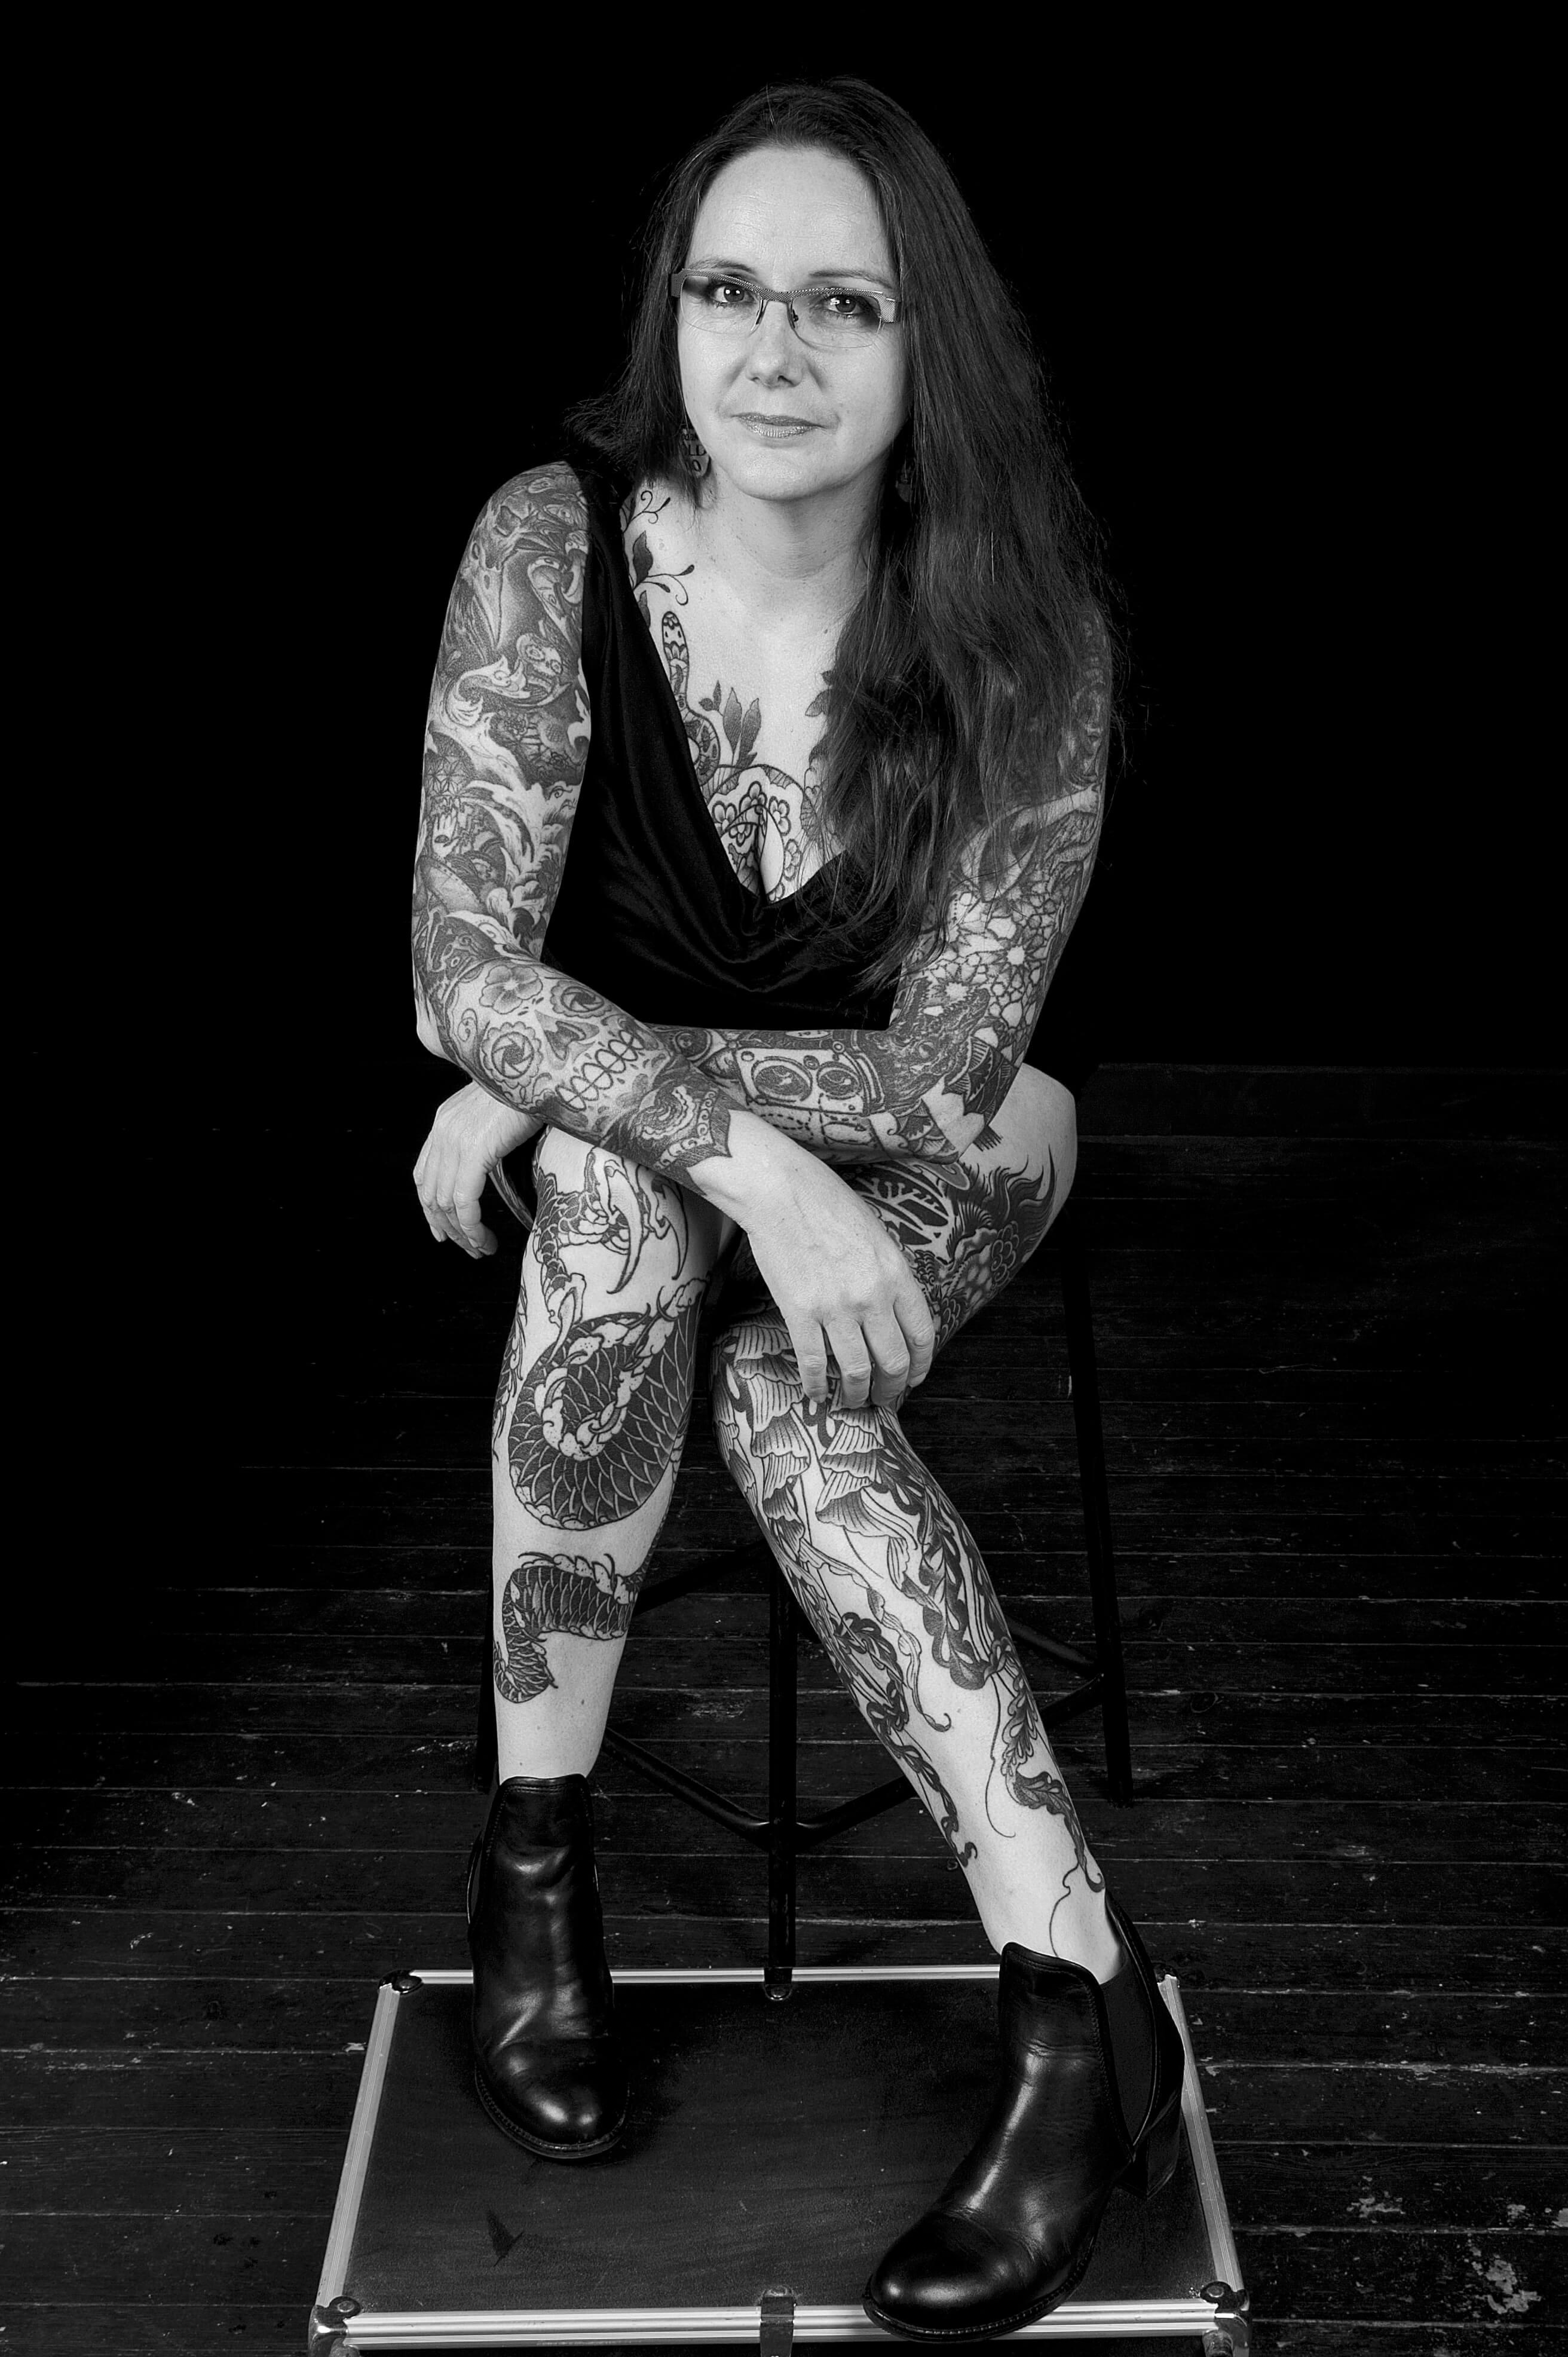 Tatuarse Foto ©Eleni Dimitriadi-Chailleux